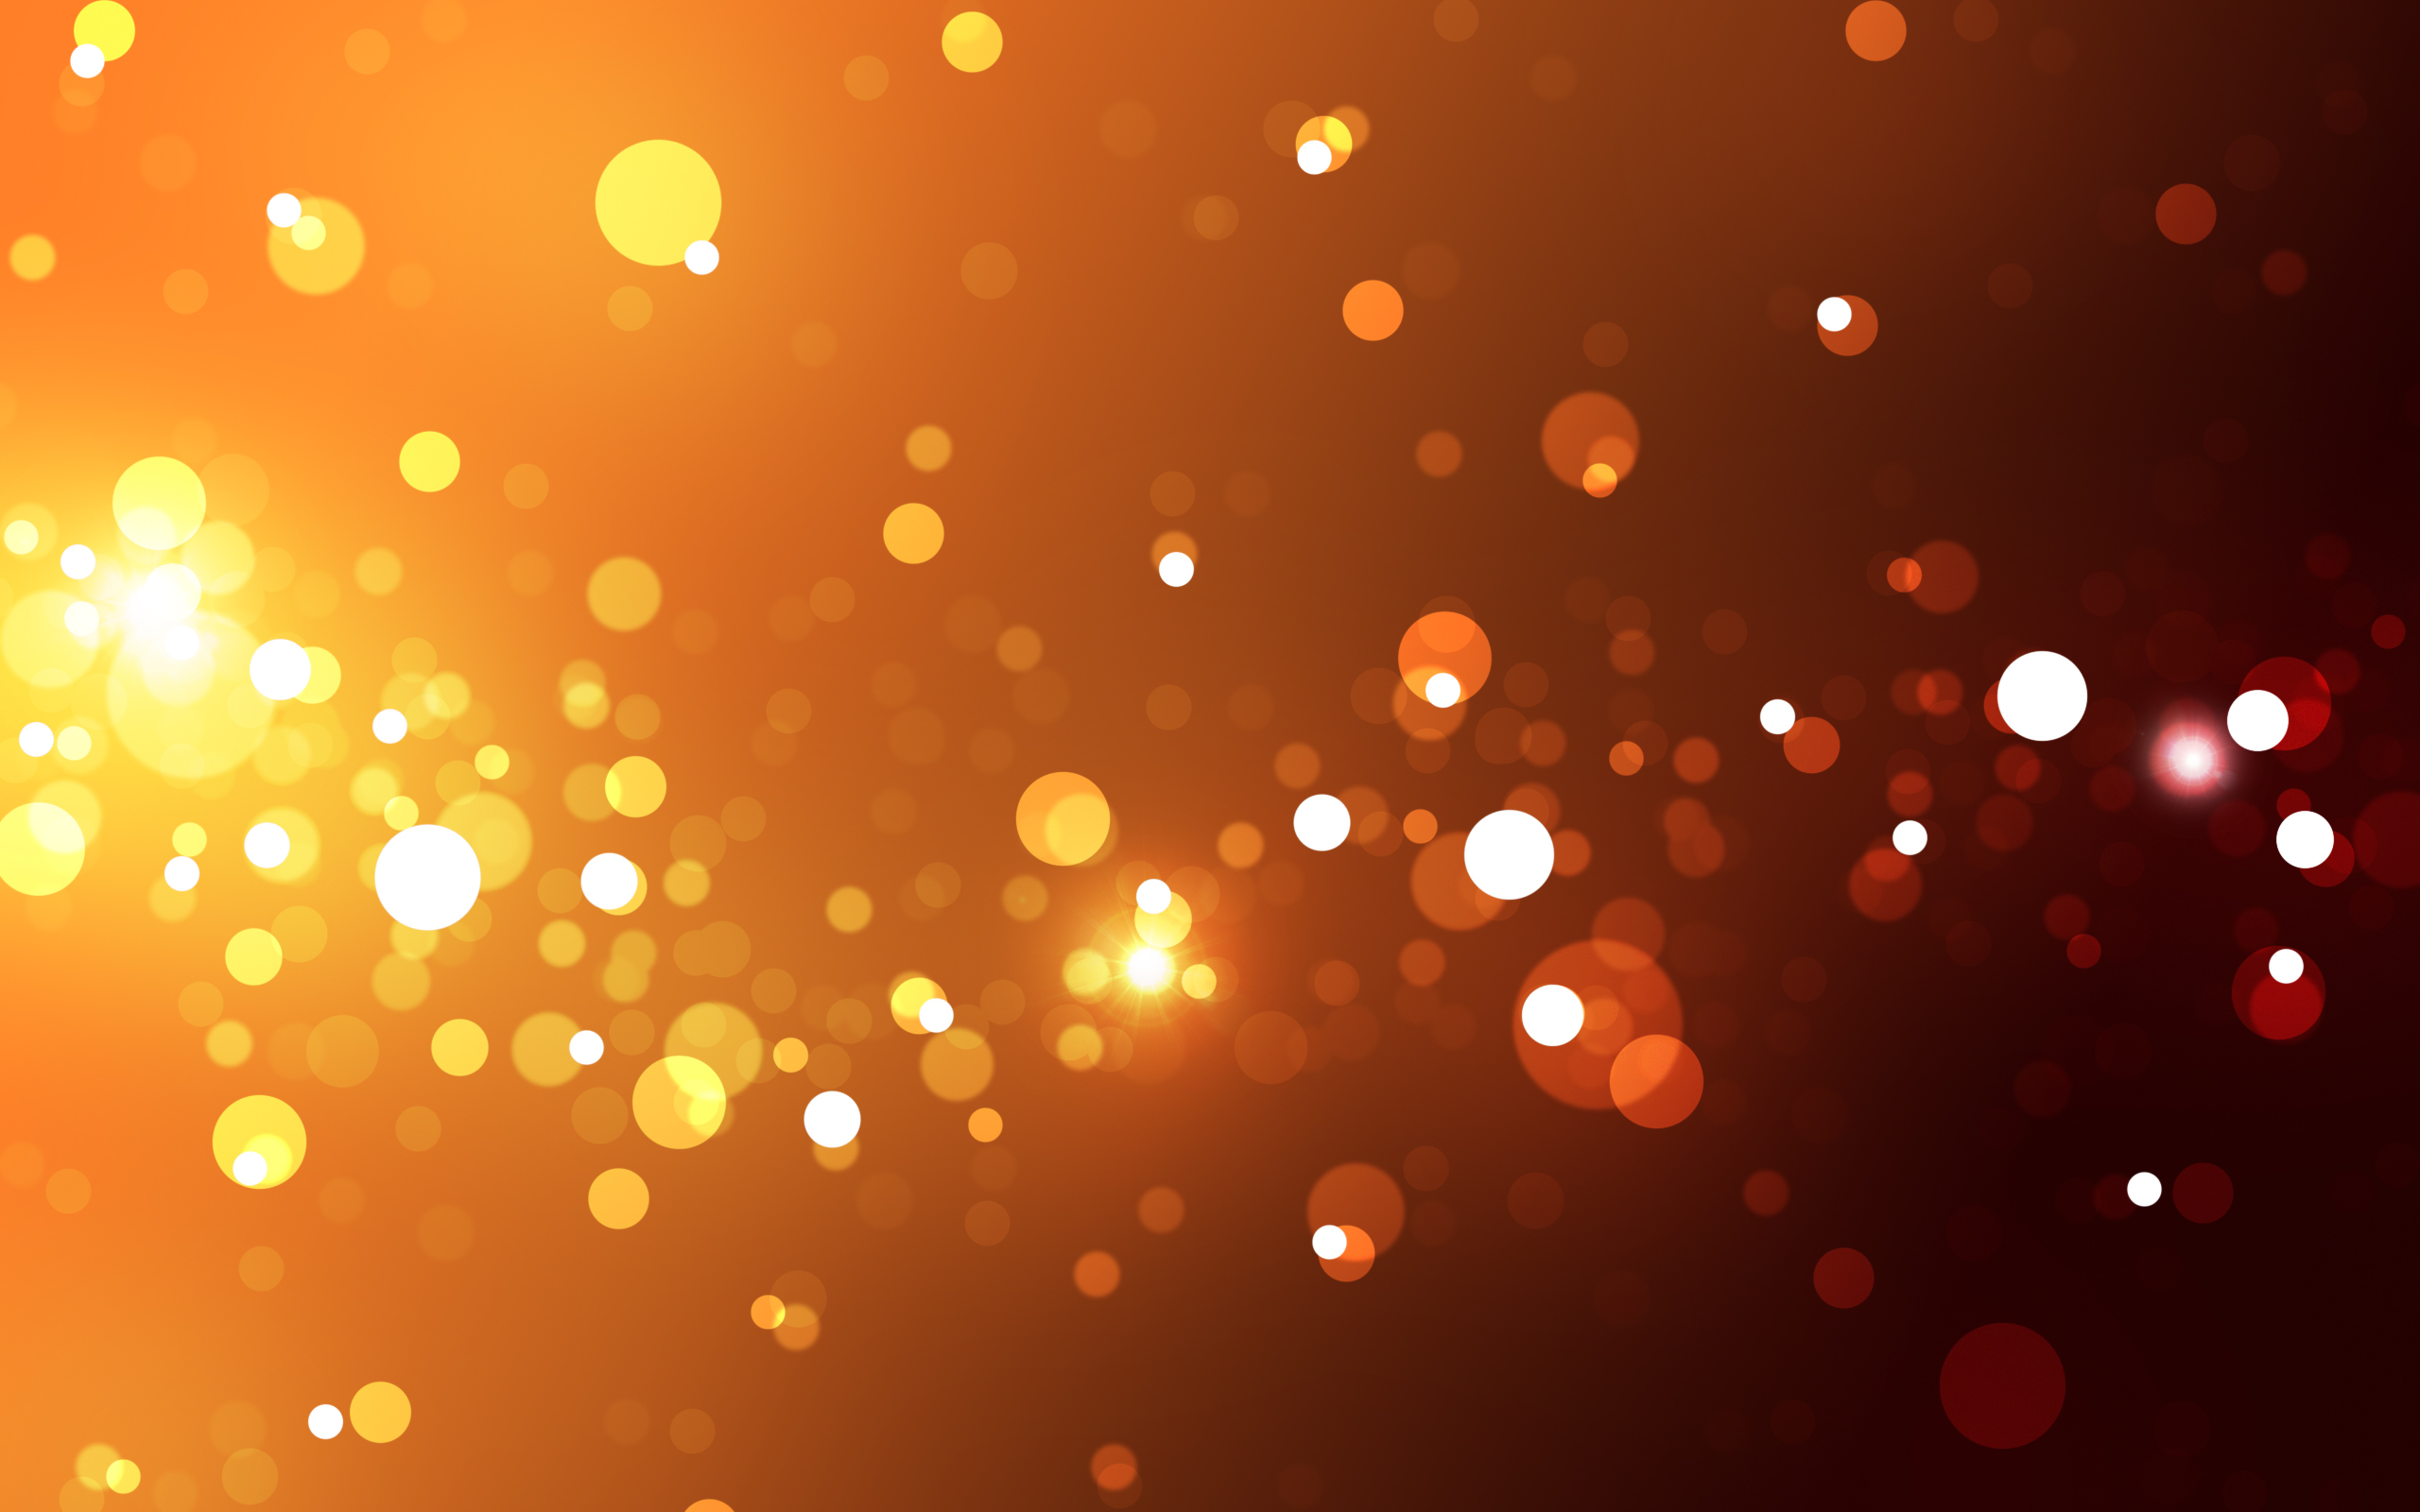 Awesome Orange Light Wallpaper 34815 2560x1600 Px